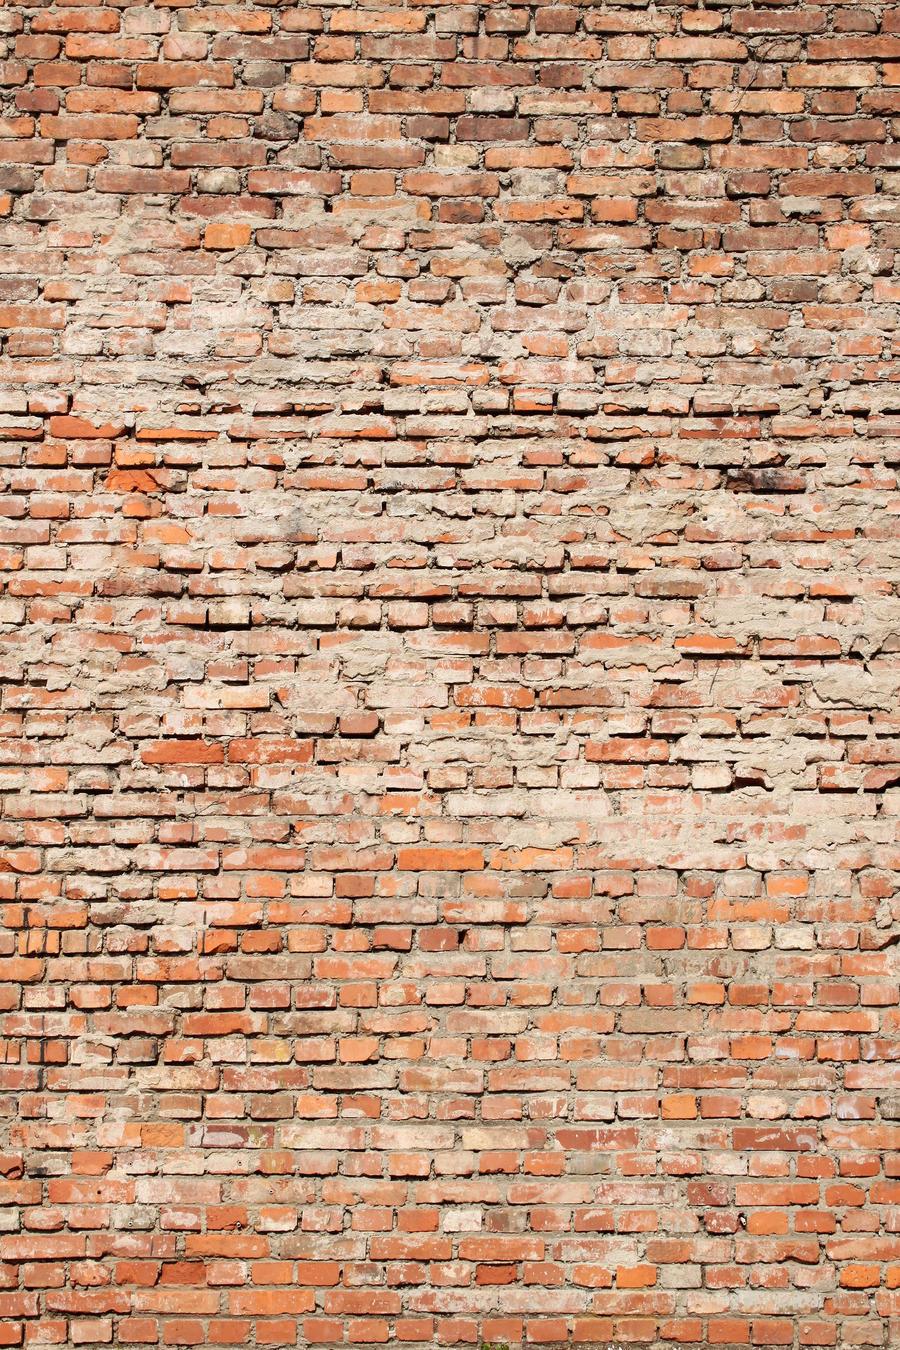 size 1280x720 painted brick - photo #34